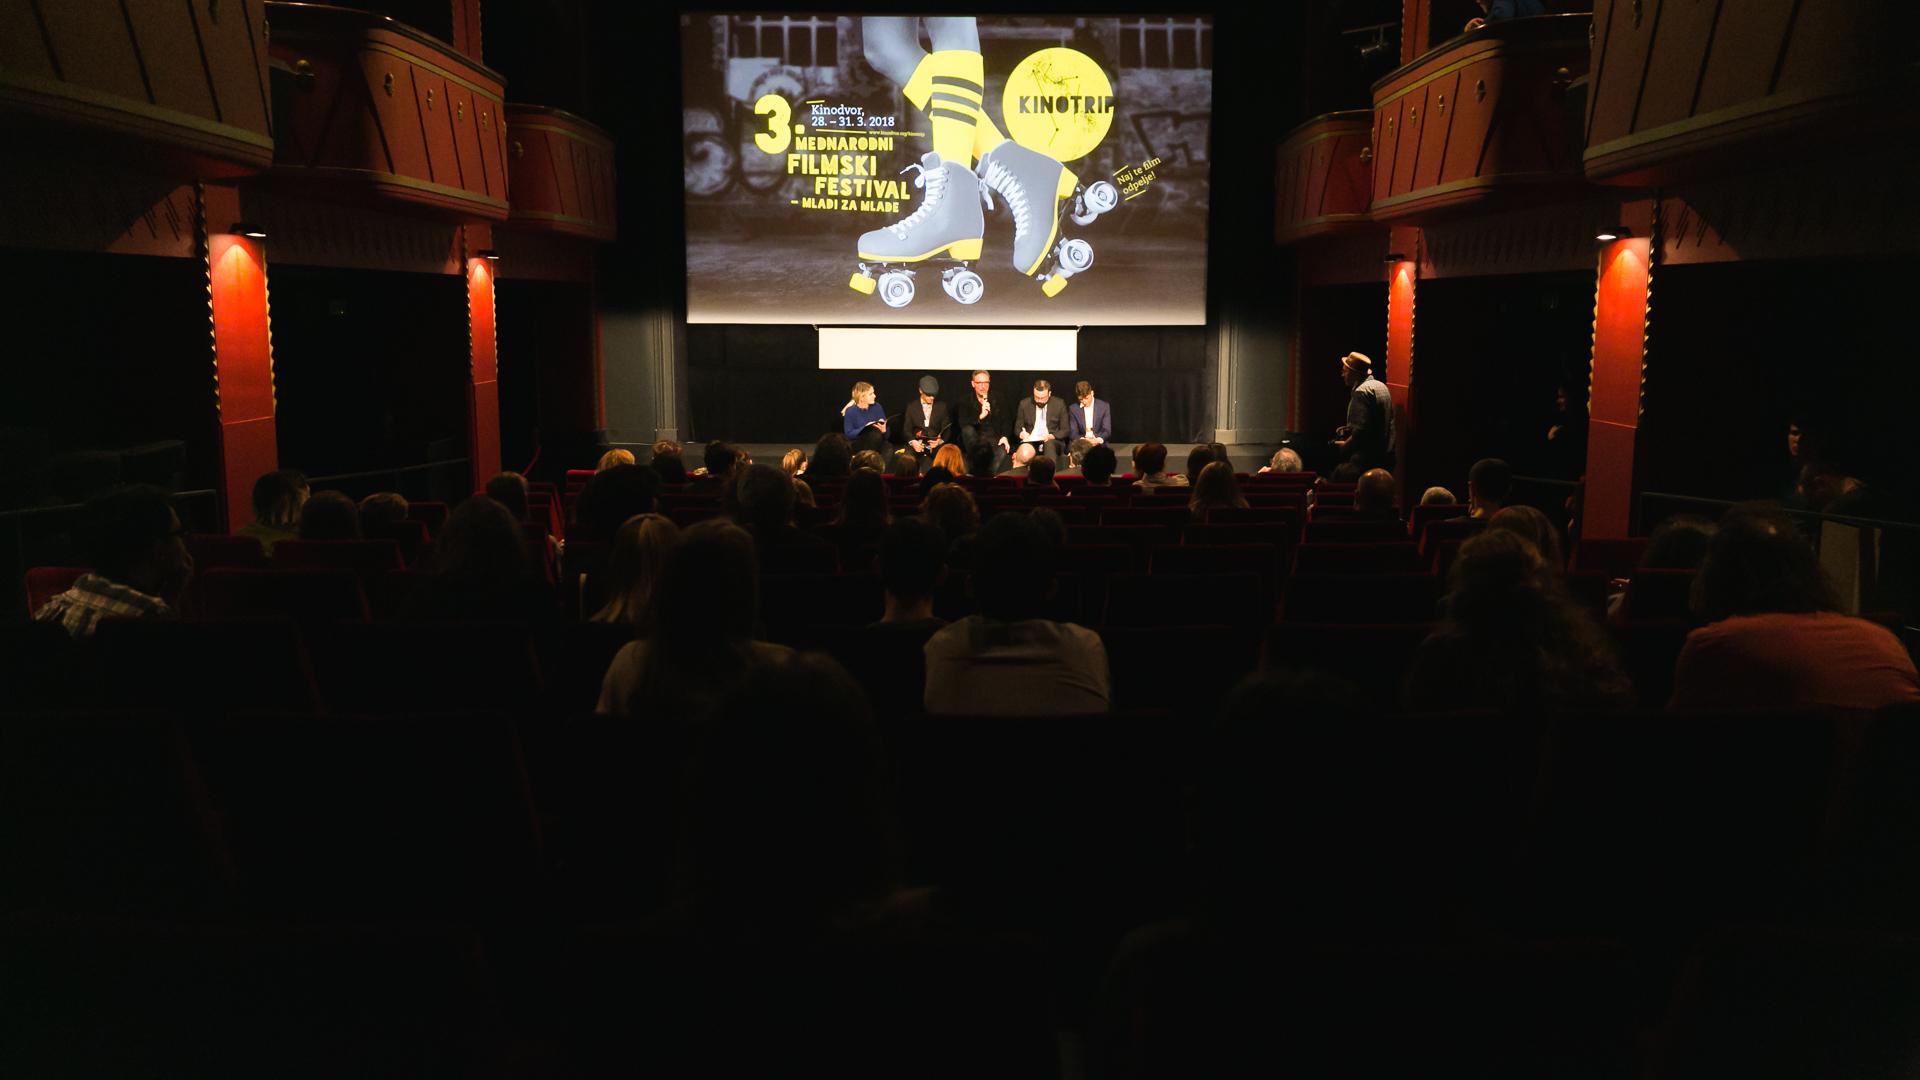 Foto & video utrinki 3. festivala Kinotrip